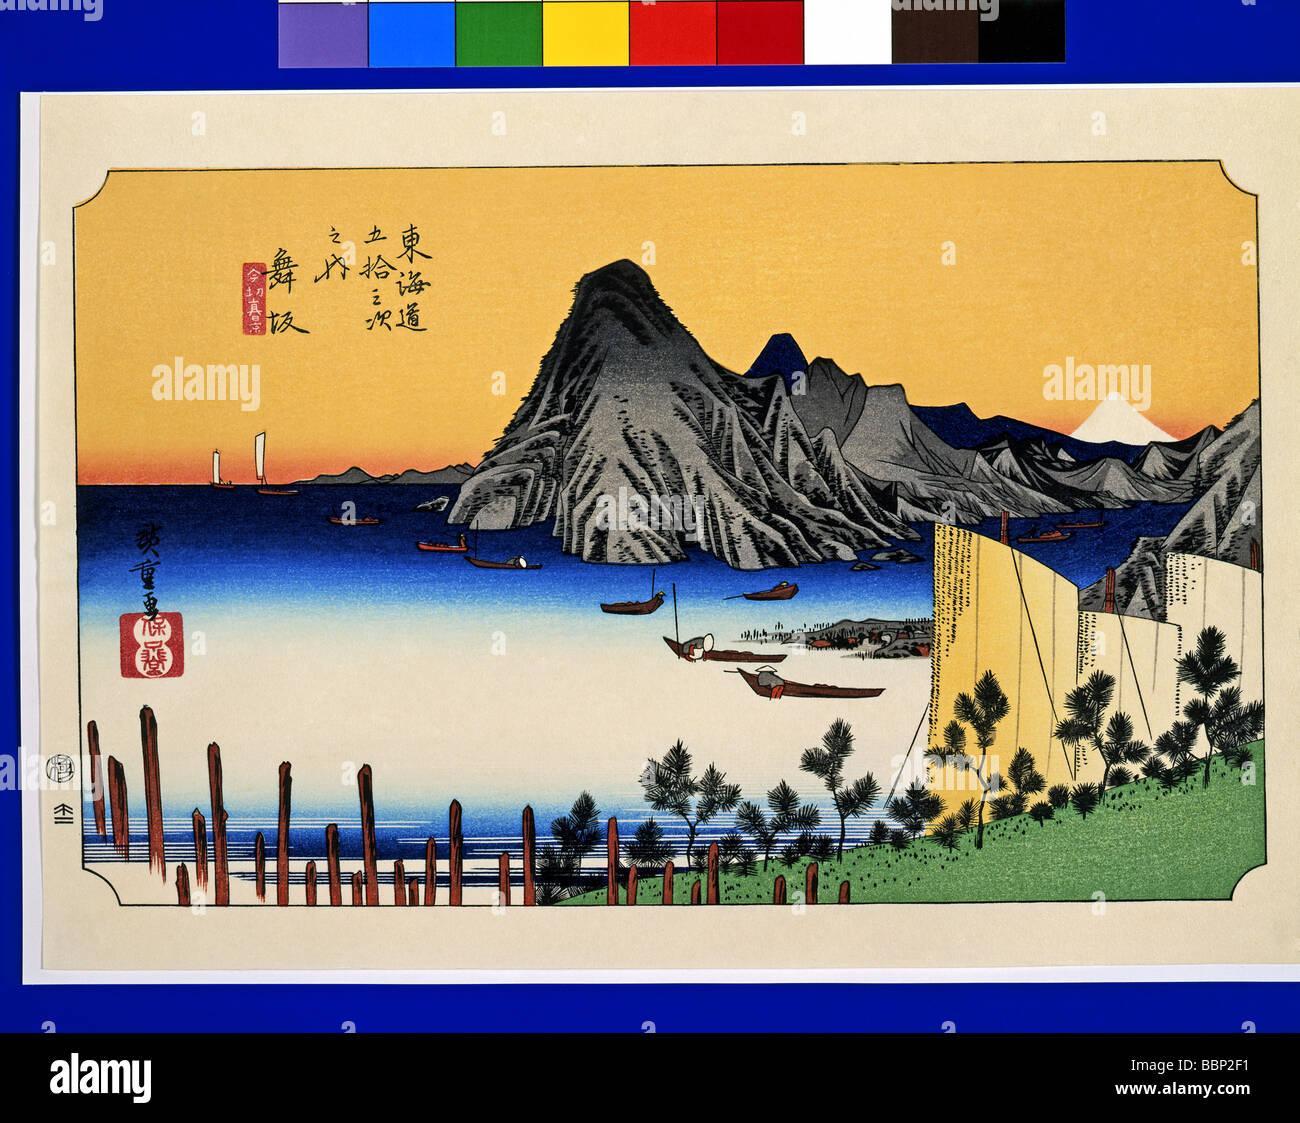 Utagawa Hiroshige, The Fifty-three Stations of the Tokaido, Maisaka, - Stock Image